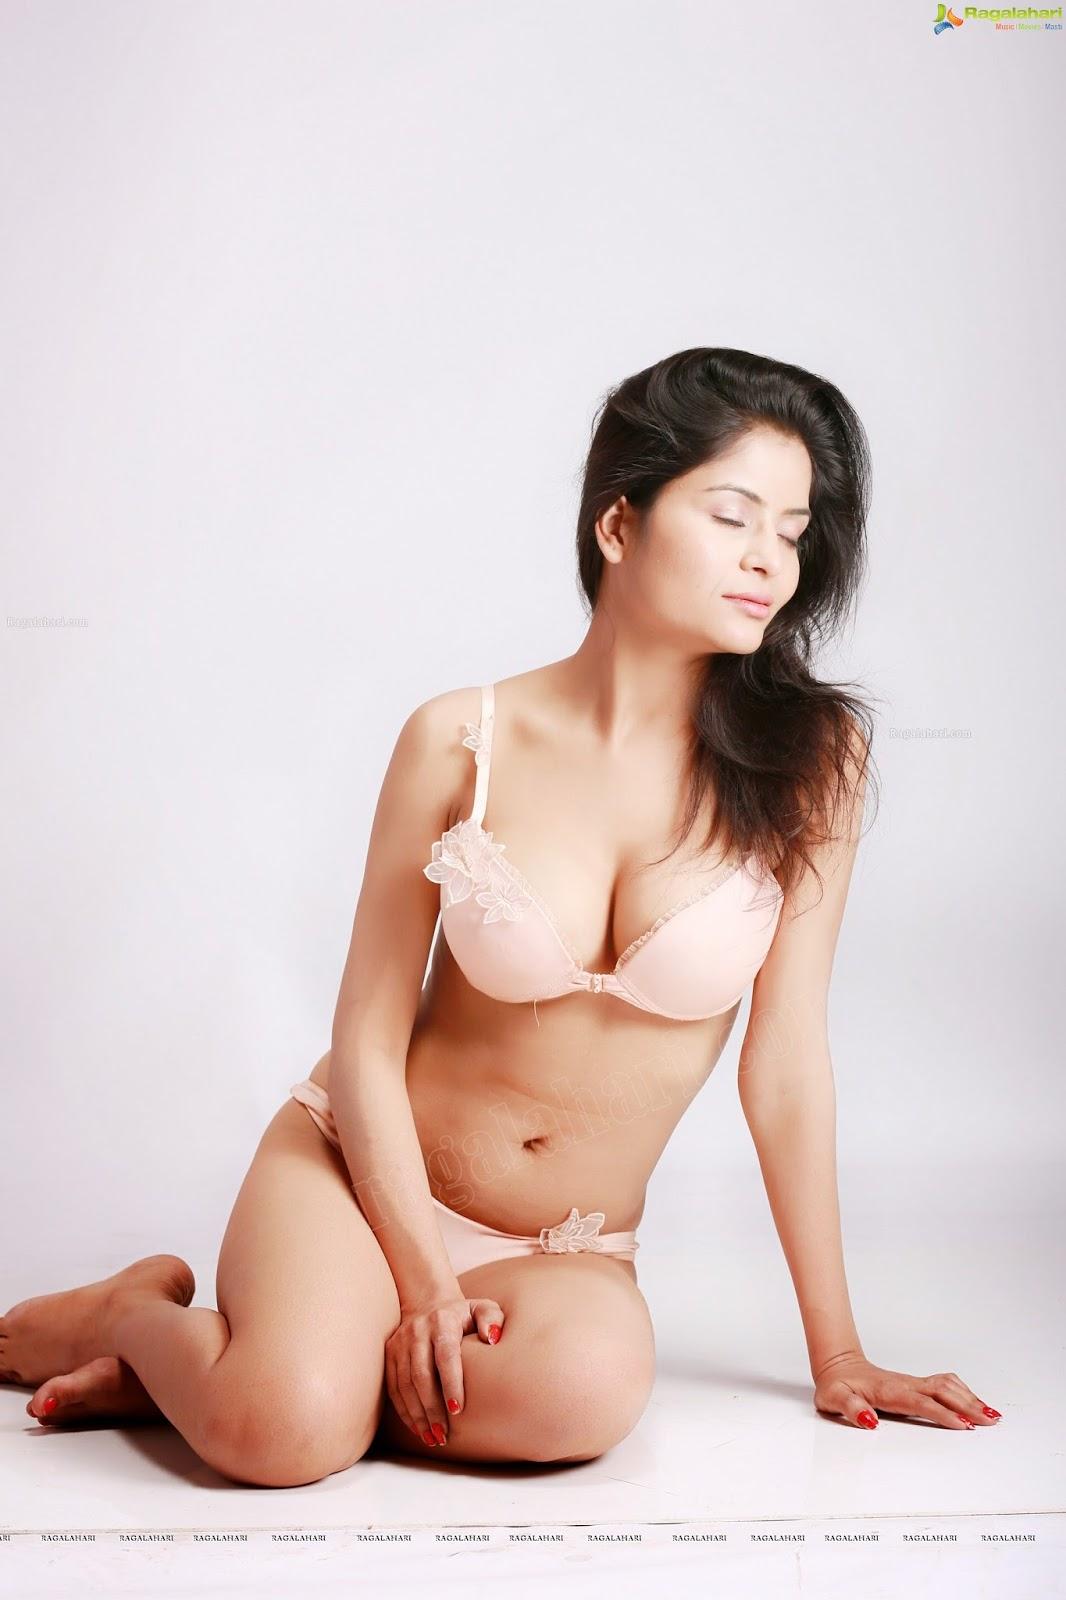 Latest hot Gehana vasisth HQ Bikini pictures